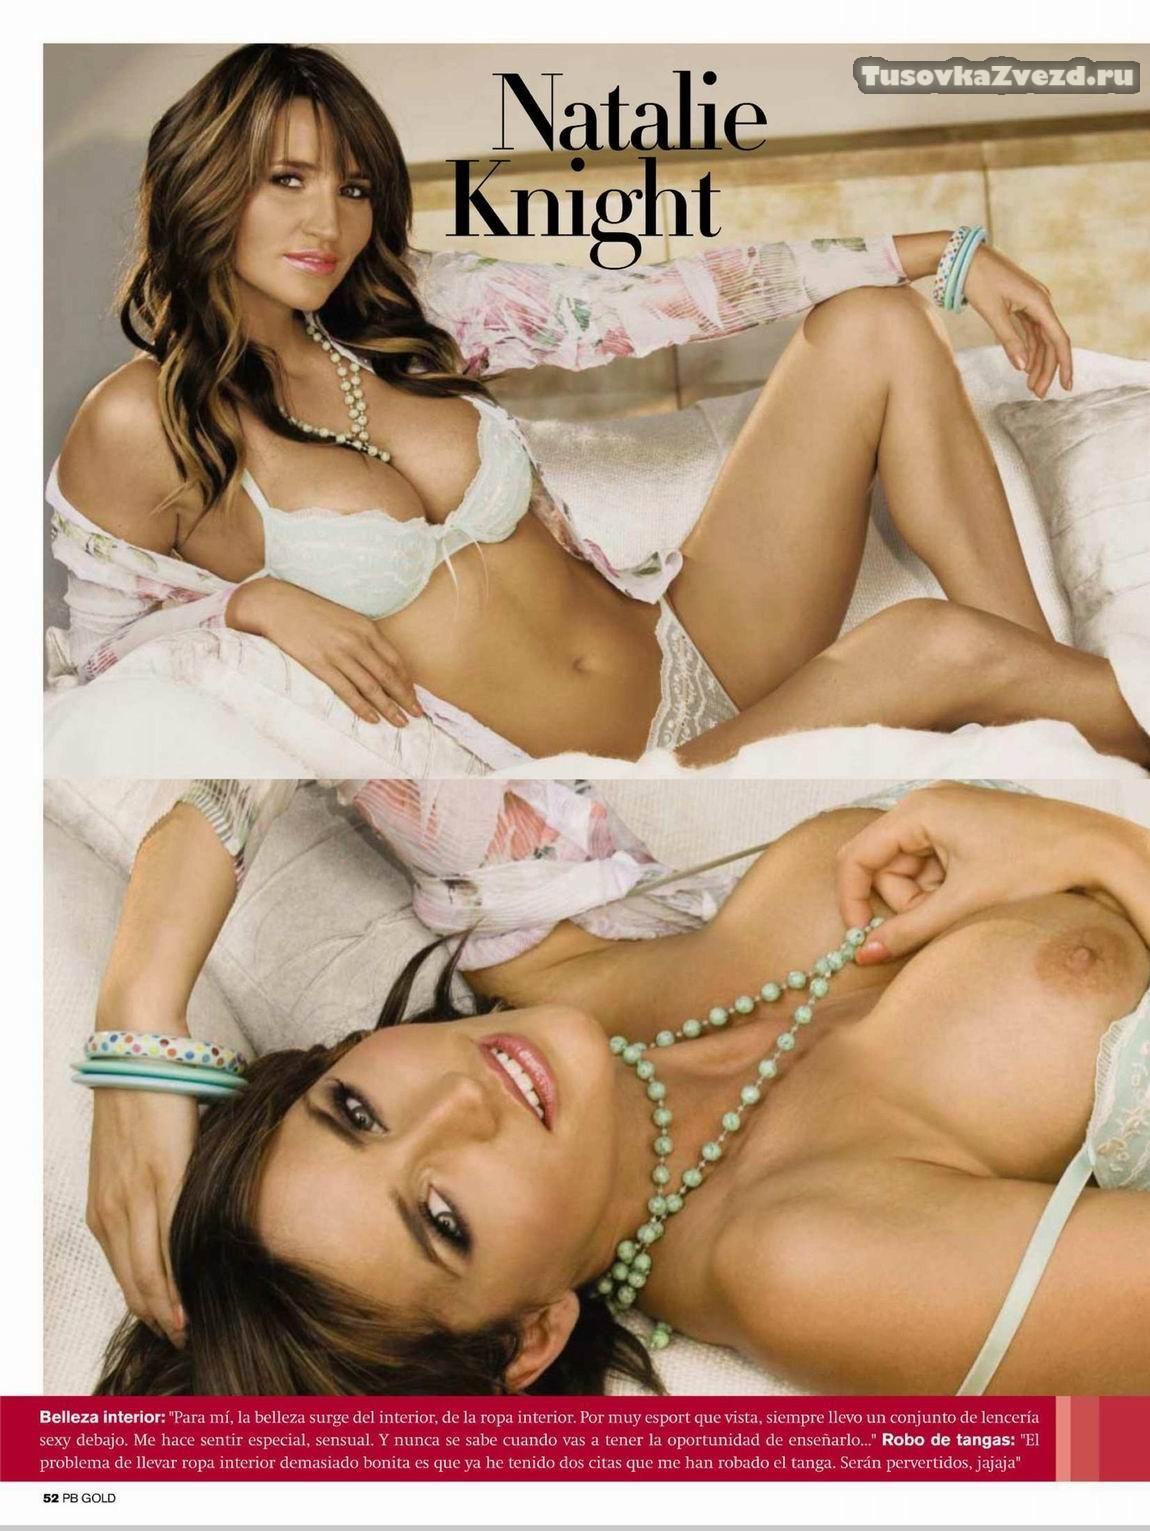 Natalie knight hardcore erotic gallery